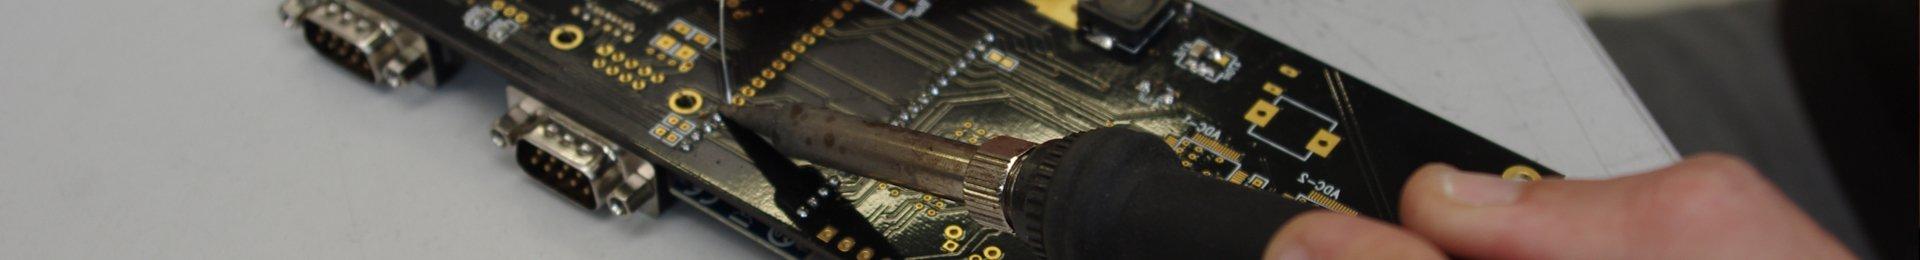 montaggio-elettronico-saldatura